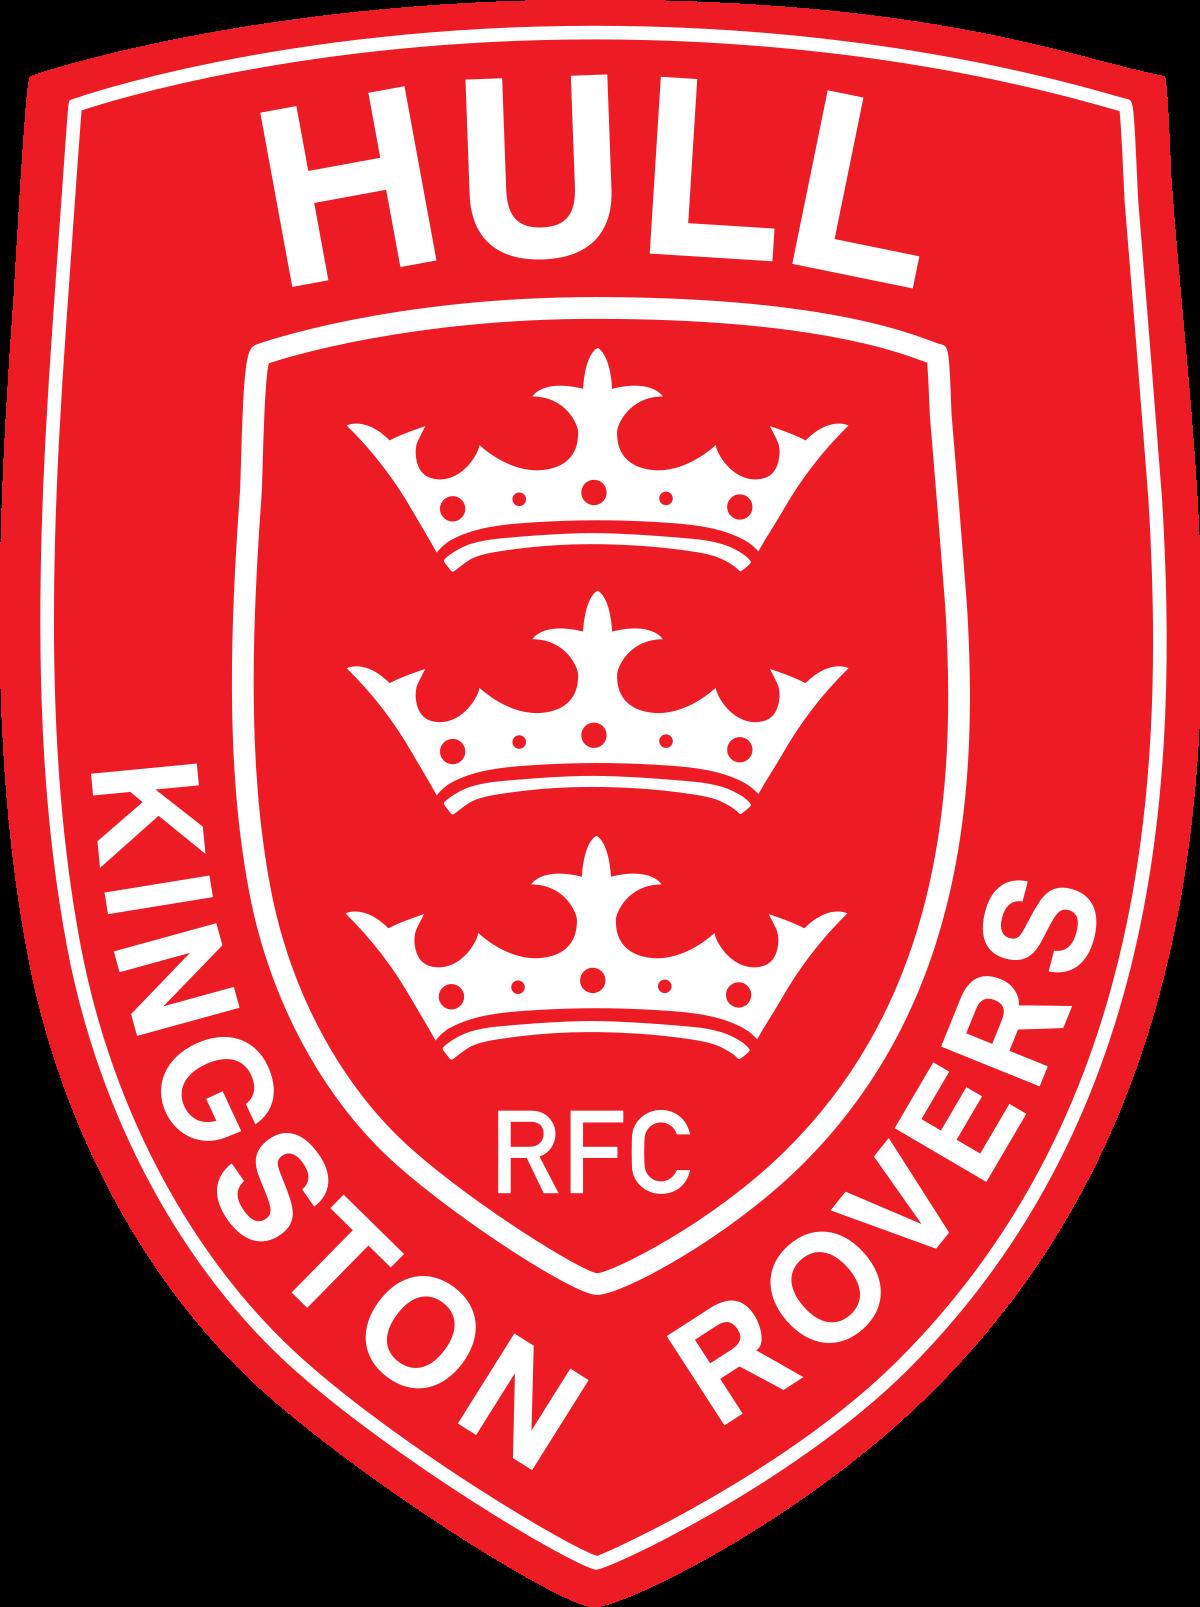 Programme TV Hull Kingston Rovers